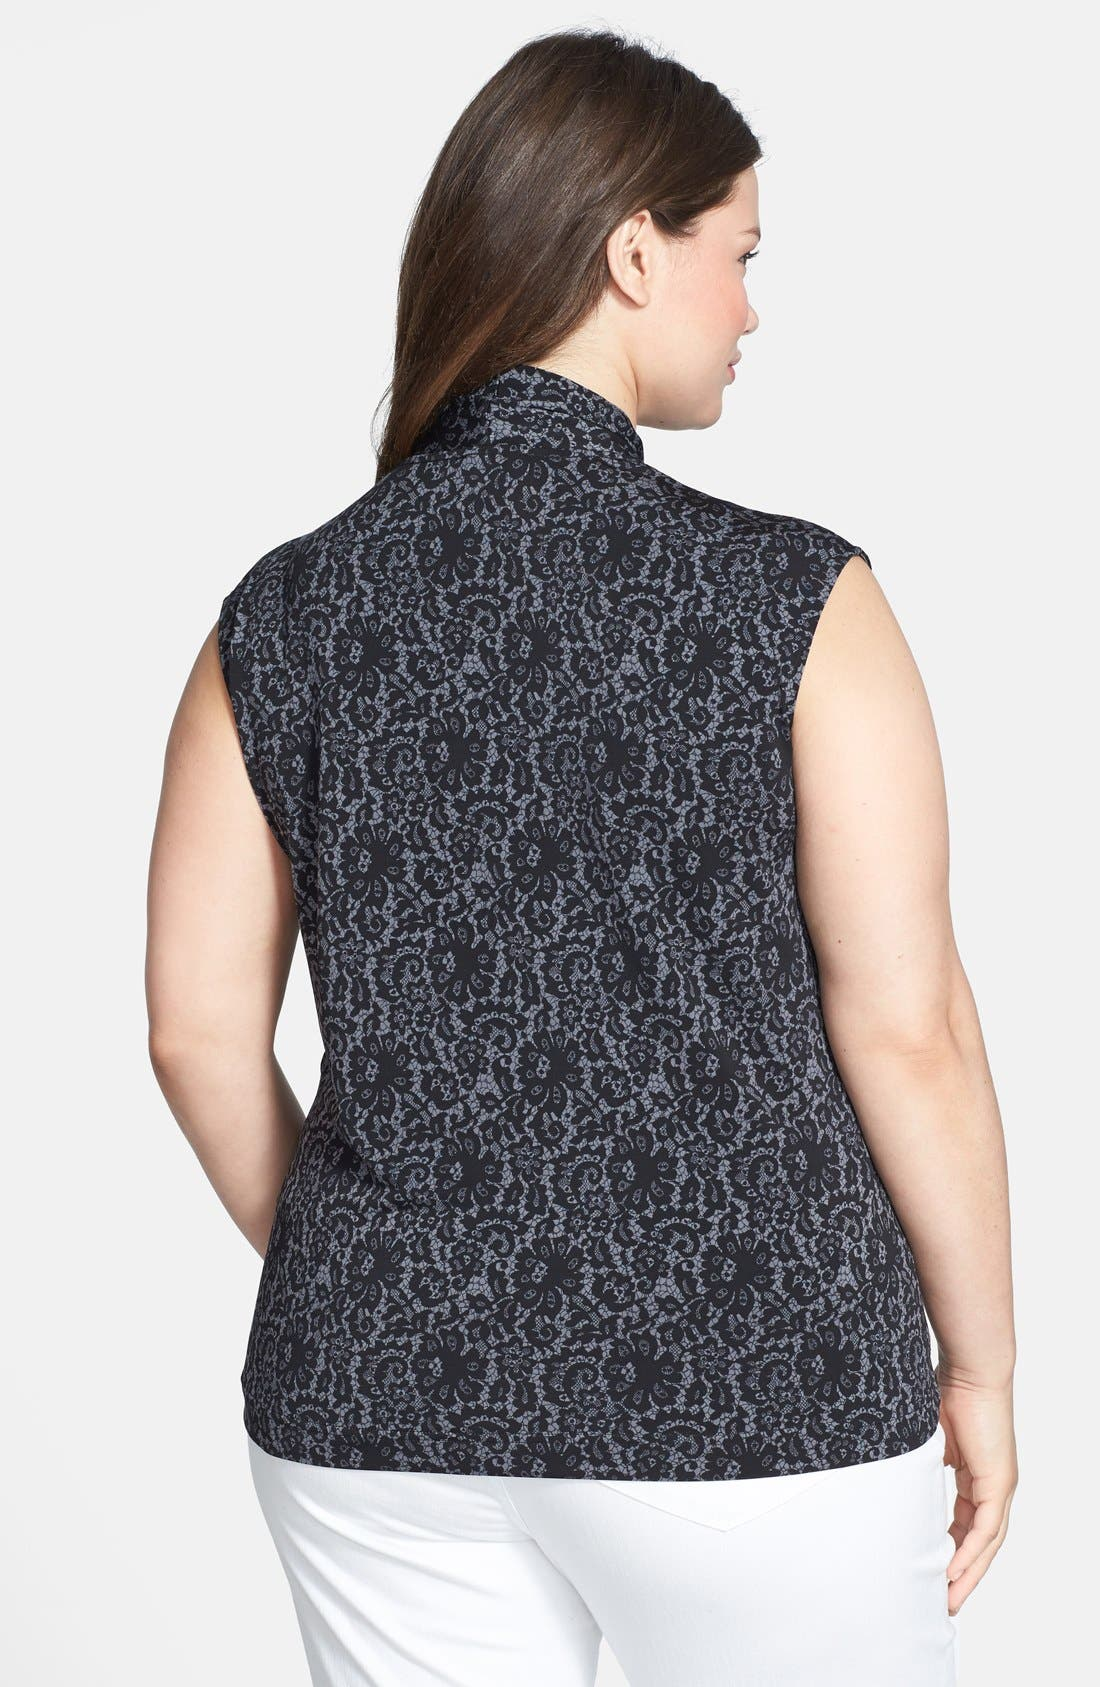 Alternate Image 2  - Vince Camuto 'Chantilly' Lace Print V-Neck Top (Plus Size)